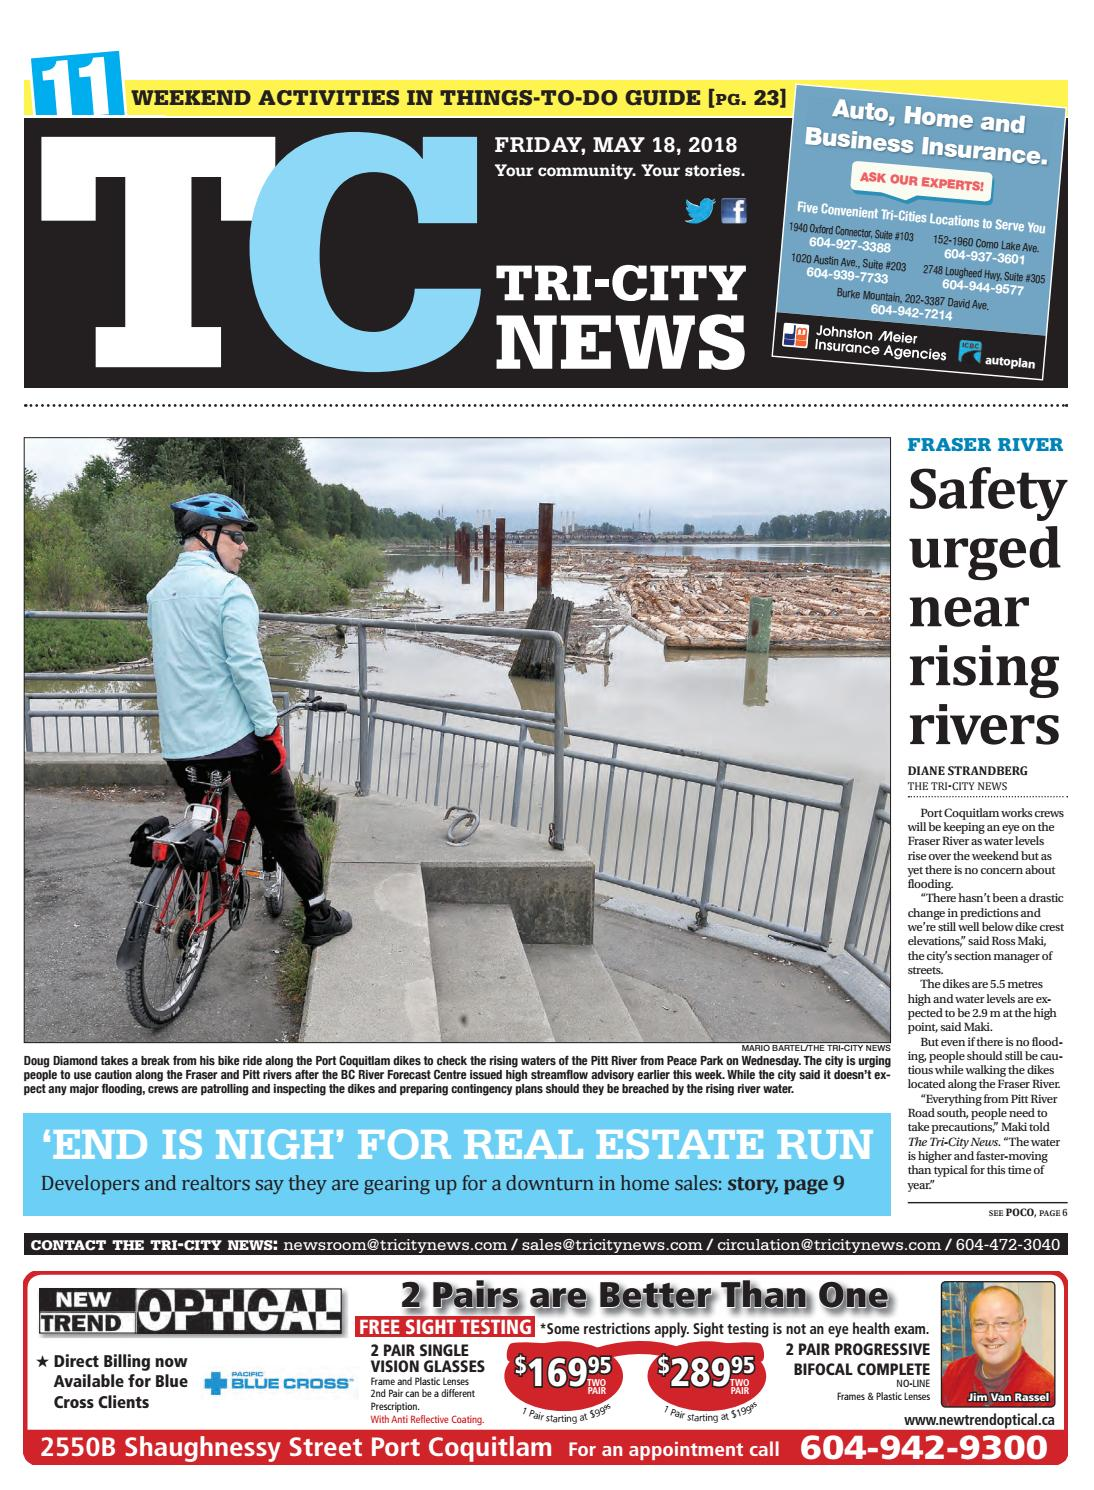 634a7f24d7 Tri-City News May 18 2018 by Tri-City News - issuu